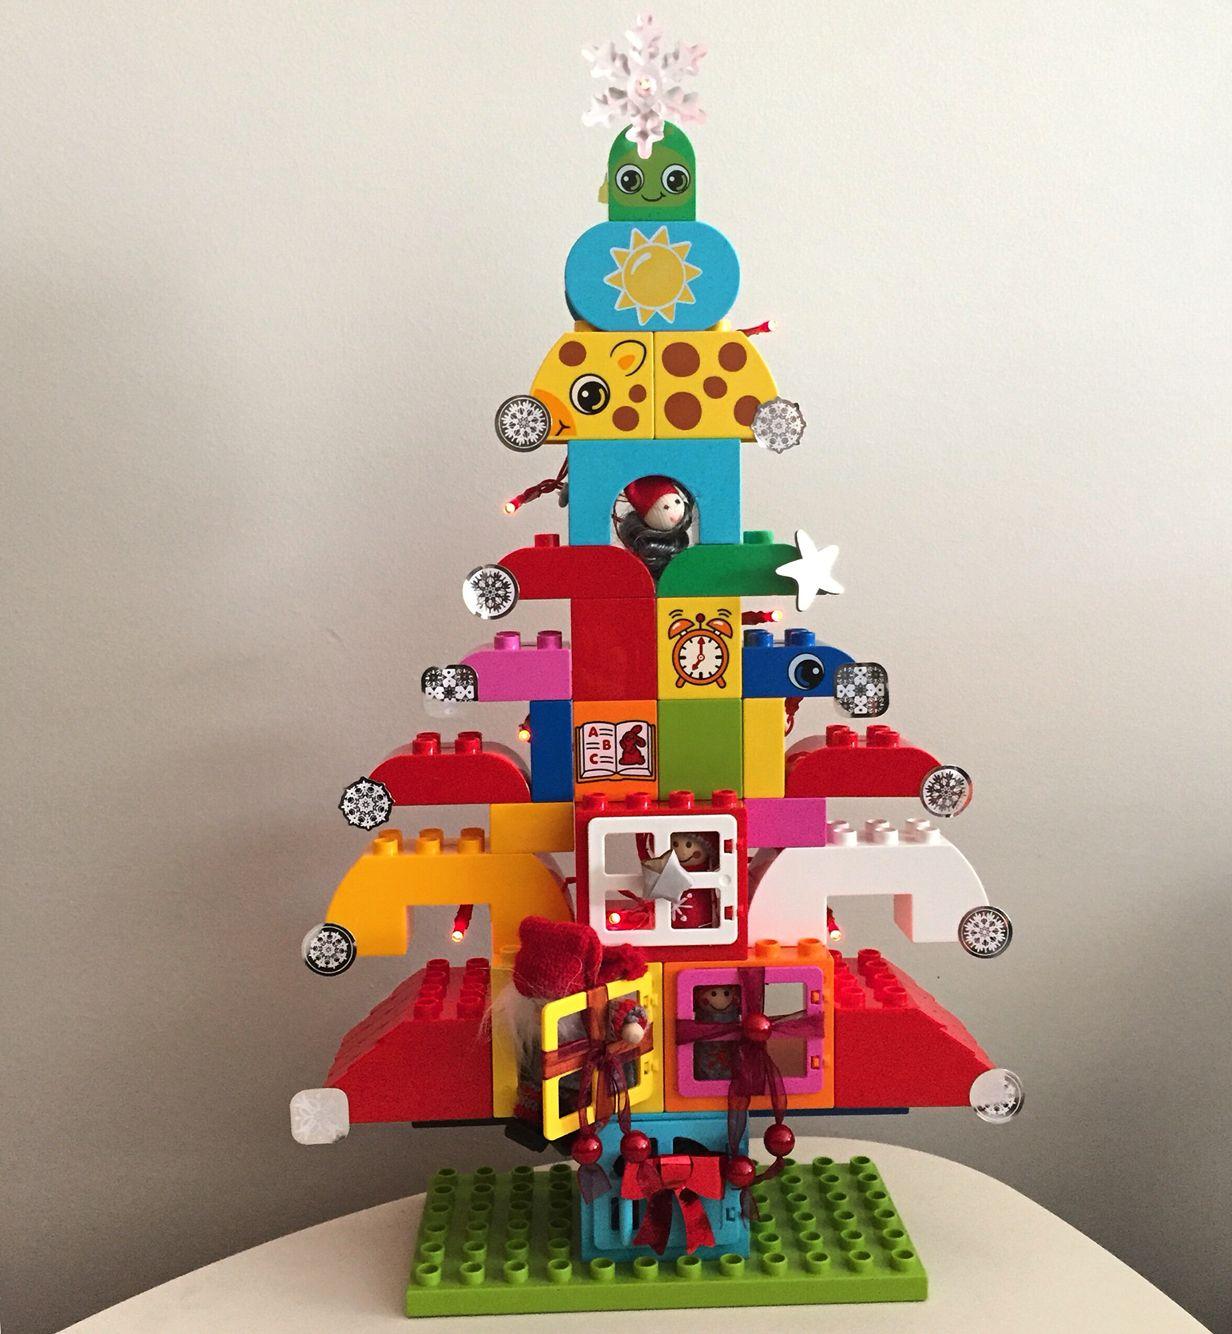 Lego christmas tree itus beginning to feel a lot like christmas